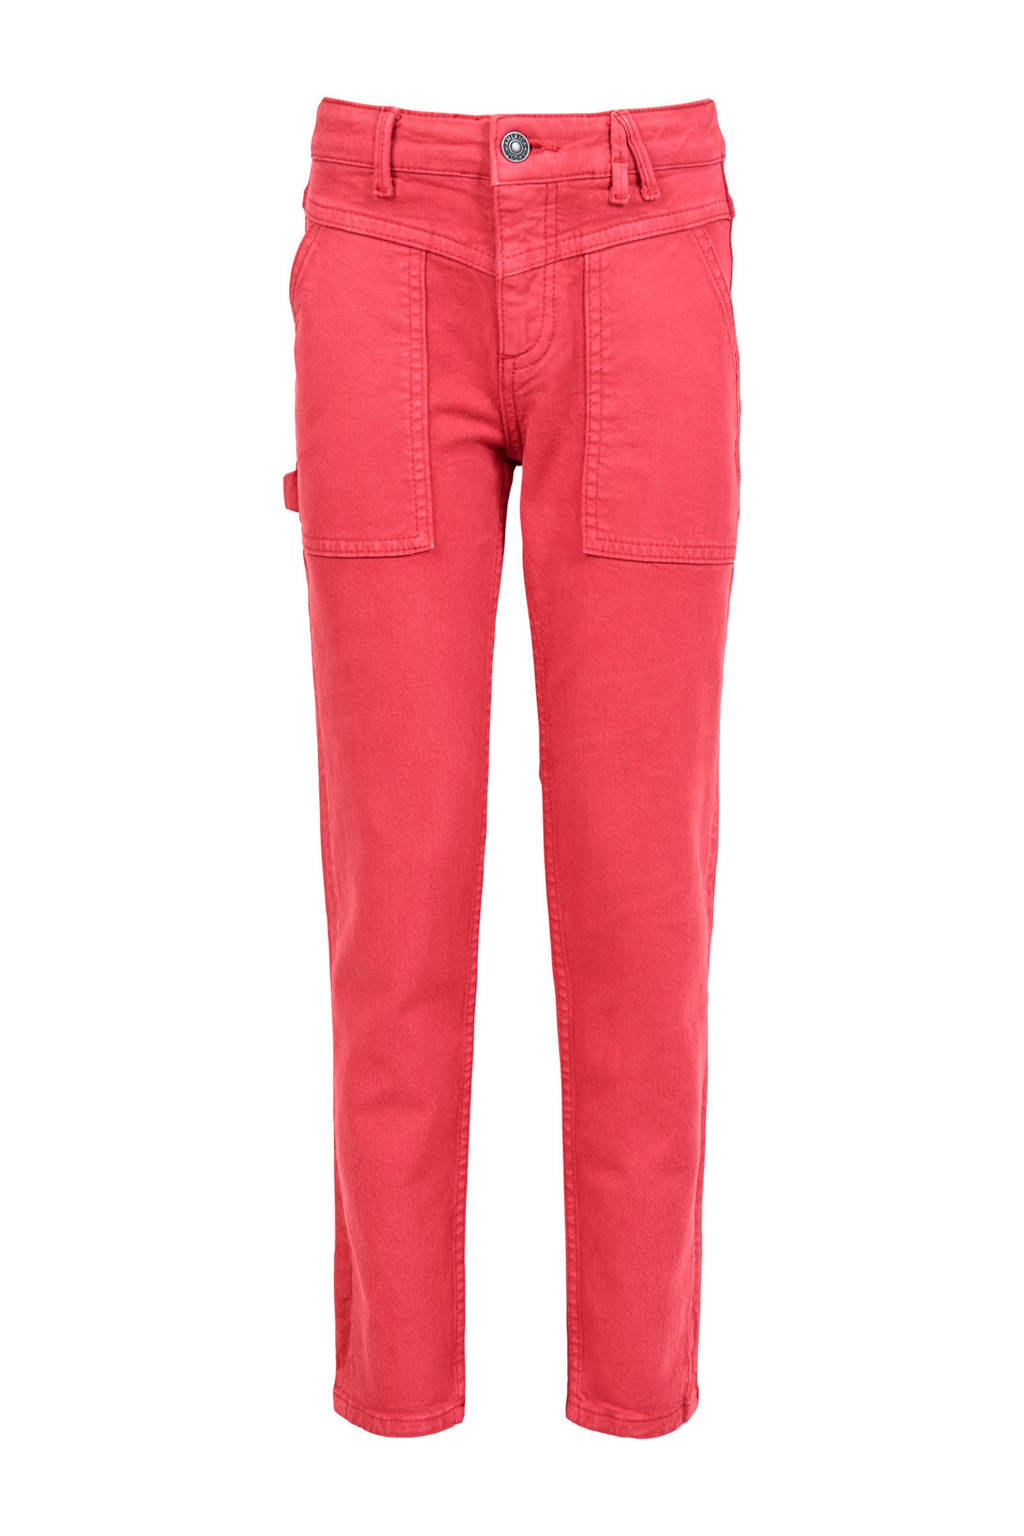 America Today Junior slim fit broek Kelsi roze, Roze